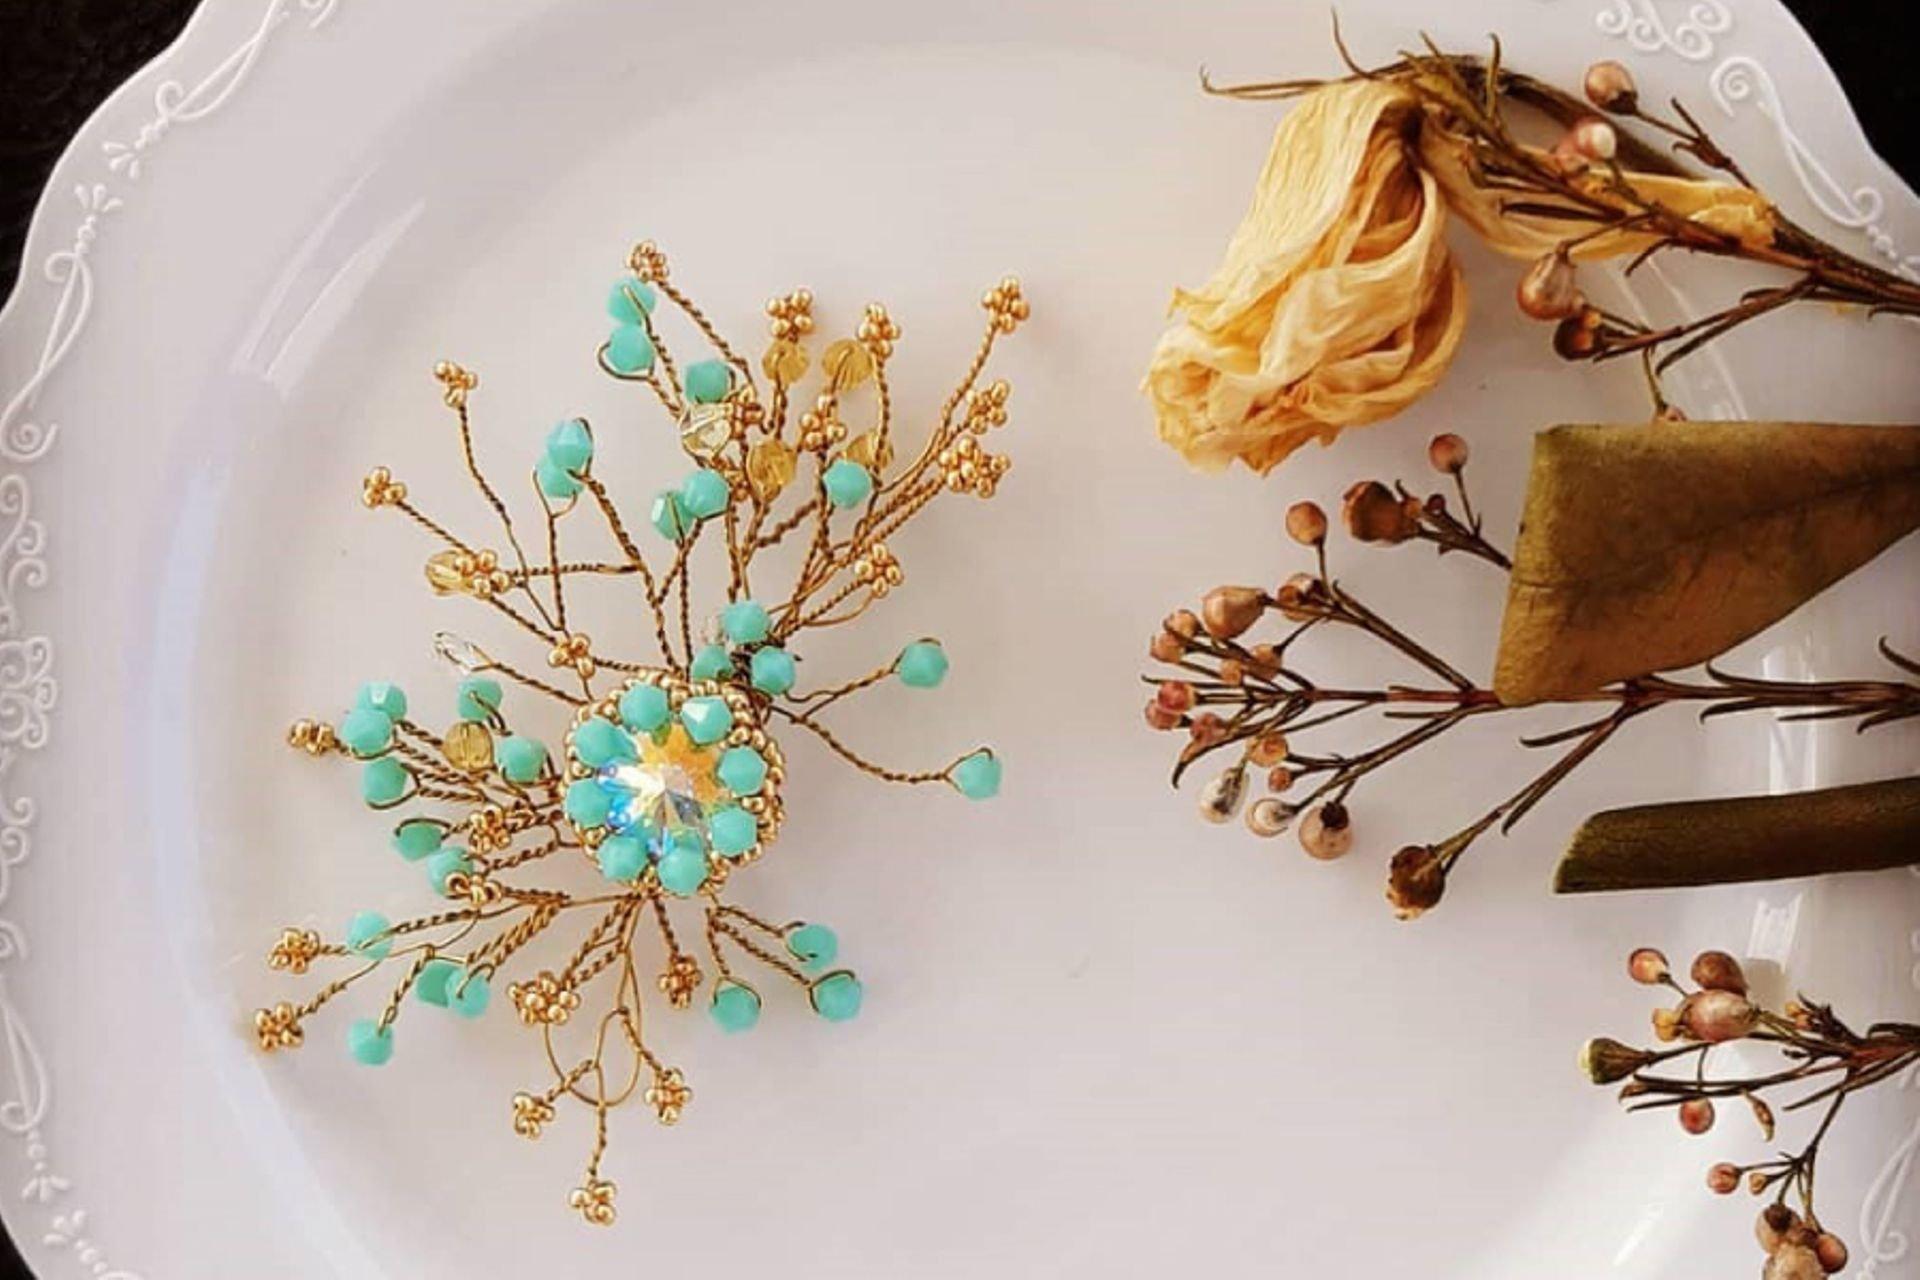 35 lantana beads jewelry designer תְמוּנָה